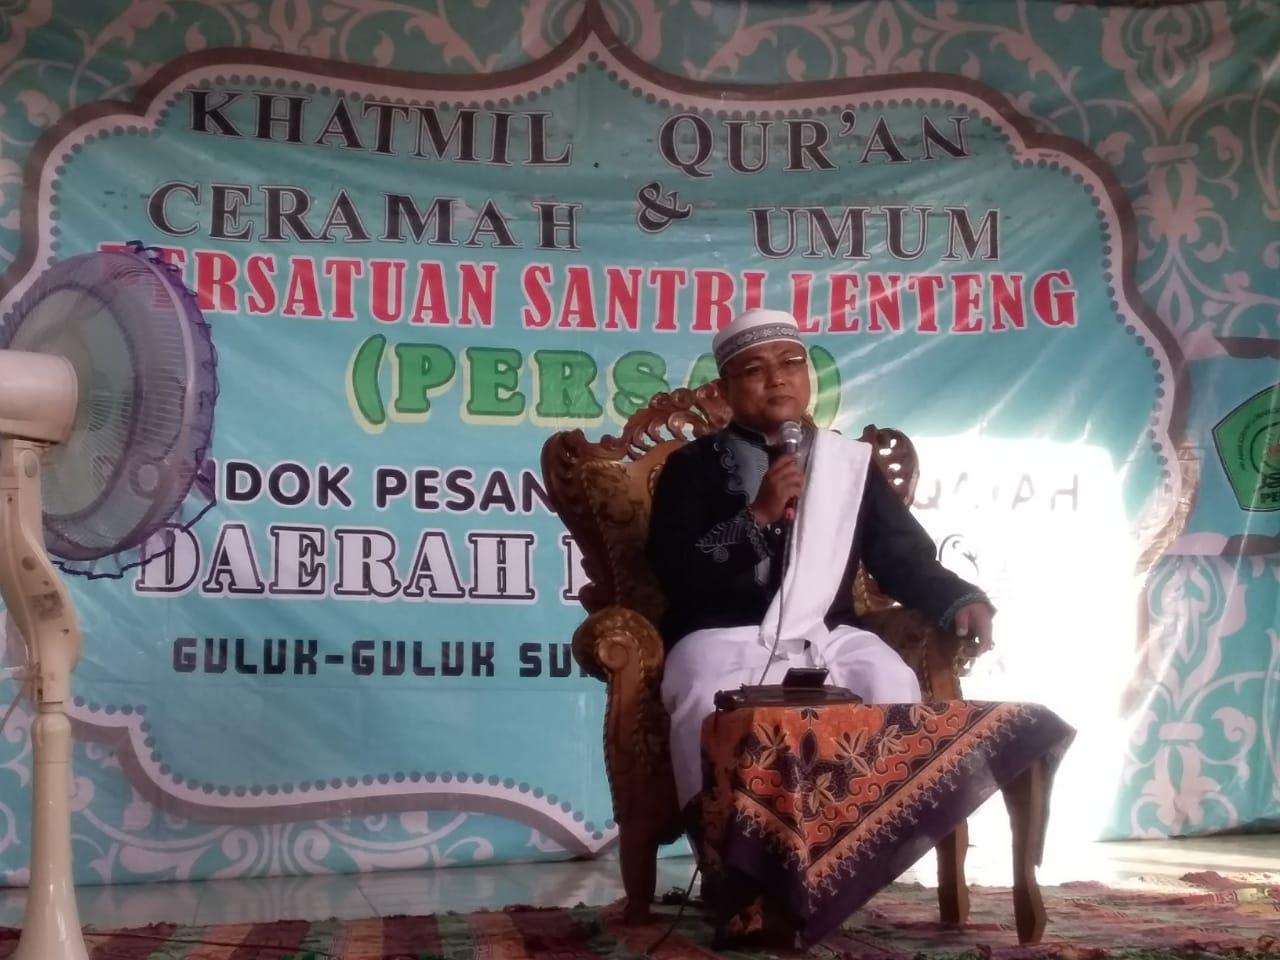 Ra Izzul Muttaqin memberikan cermah agama di acara Perdana Persal